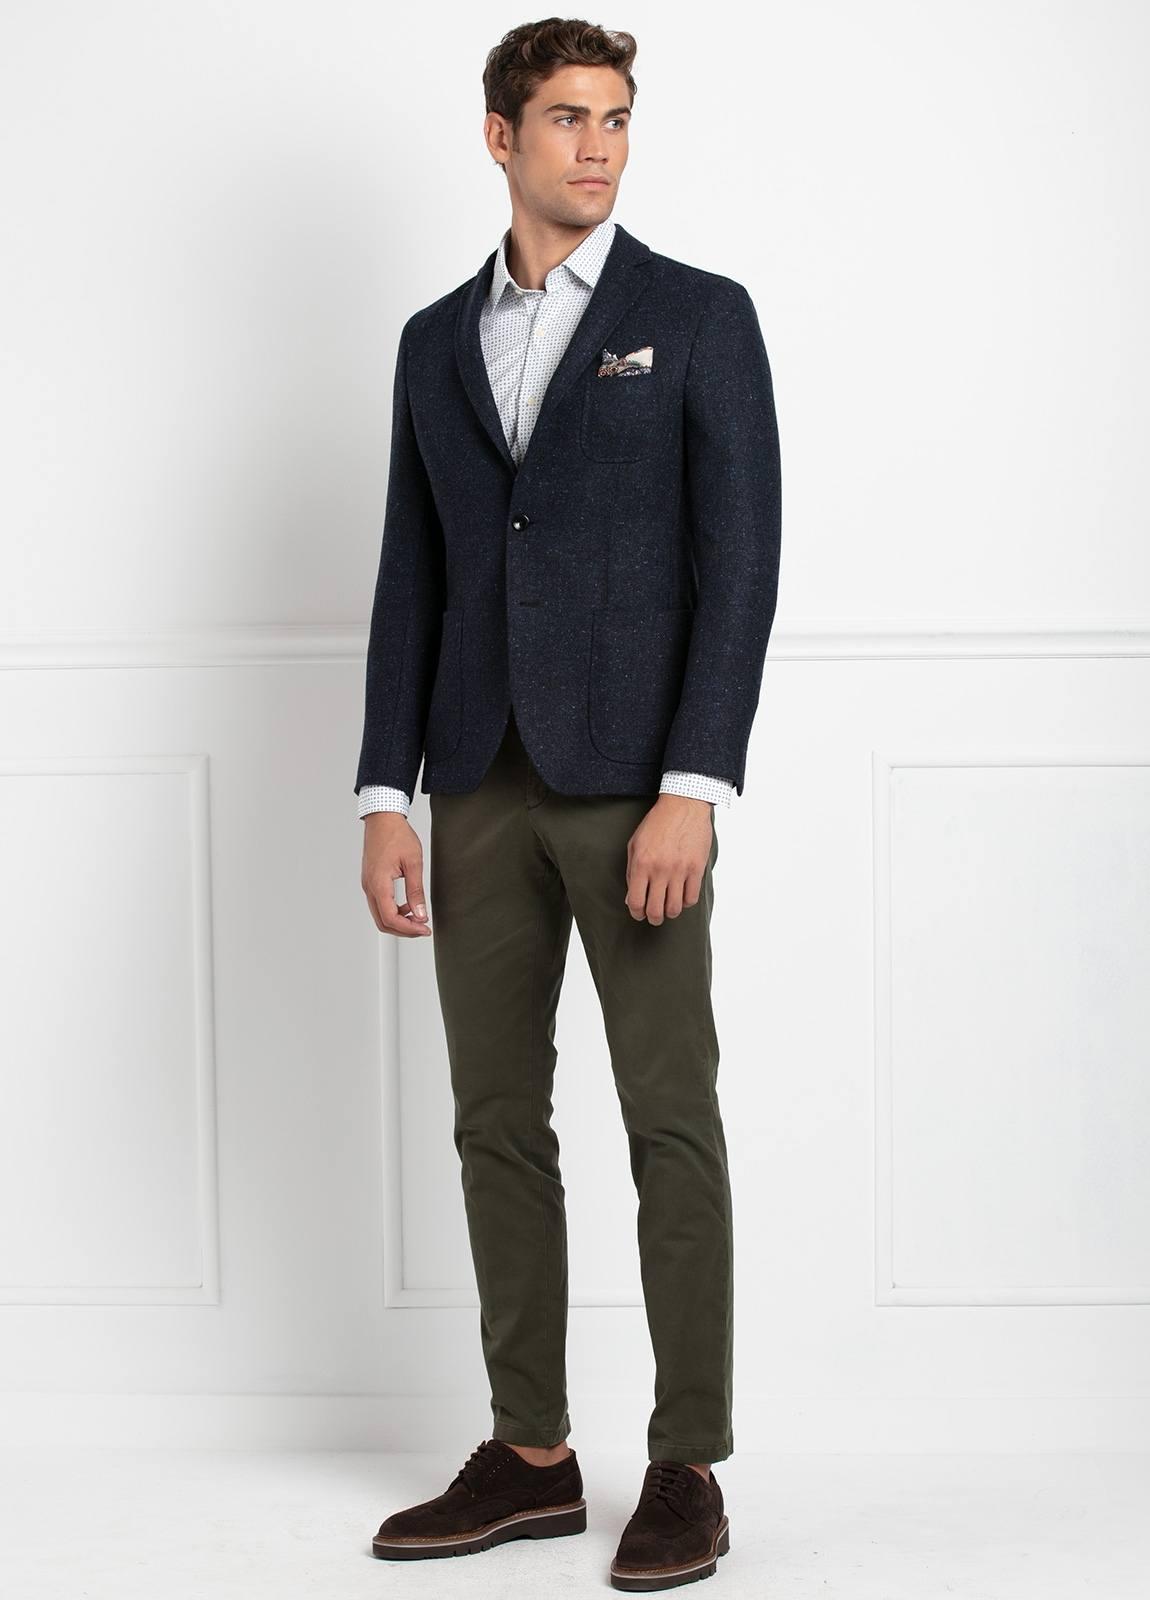 Americana SOFT JACKET Slim Fit, tejido textura color azul oscuro. 100% Lana. - Ítem3